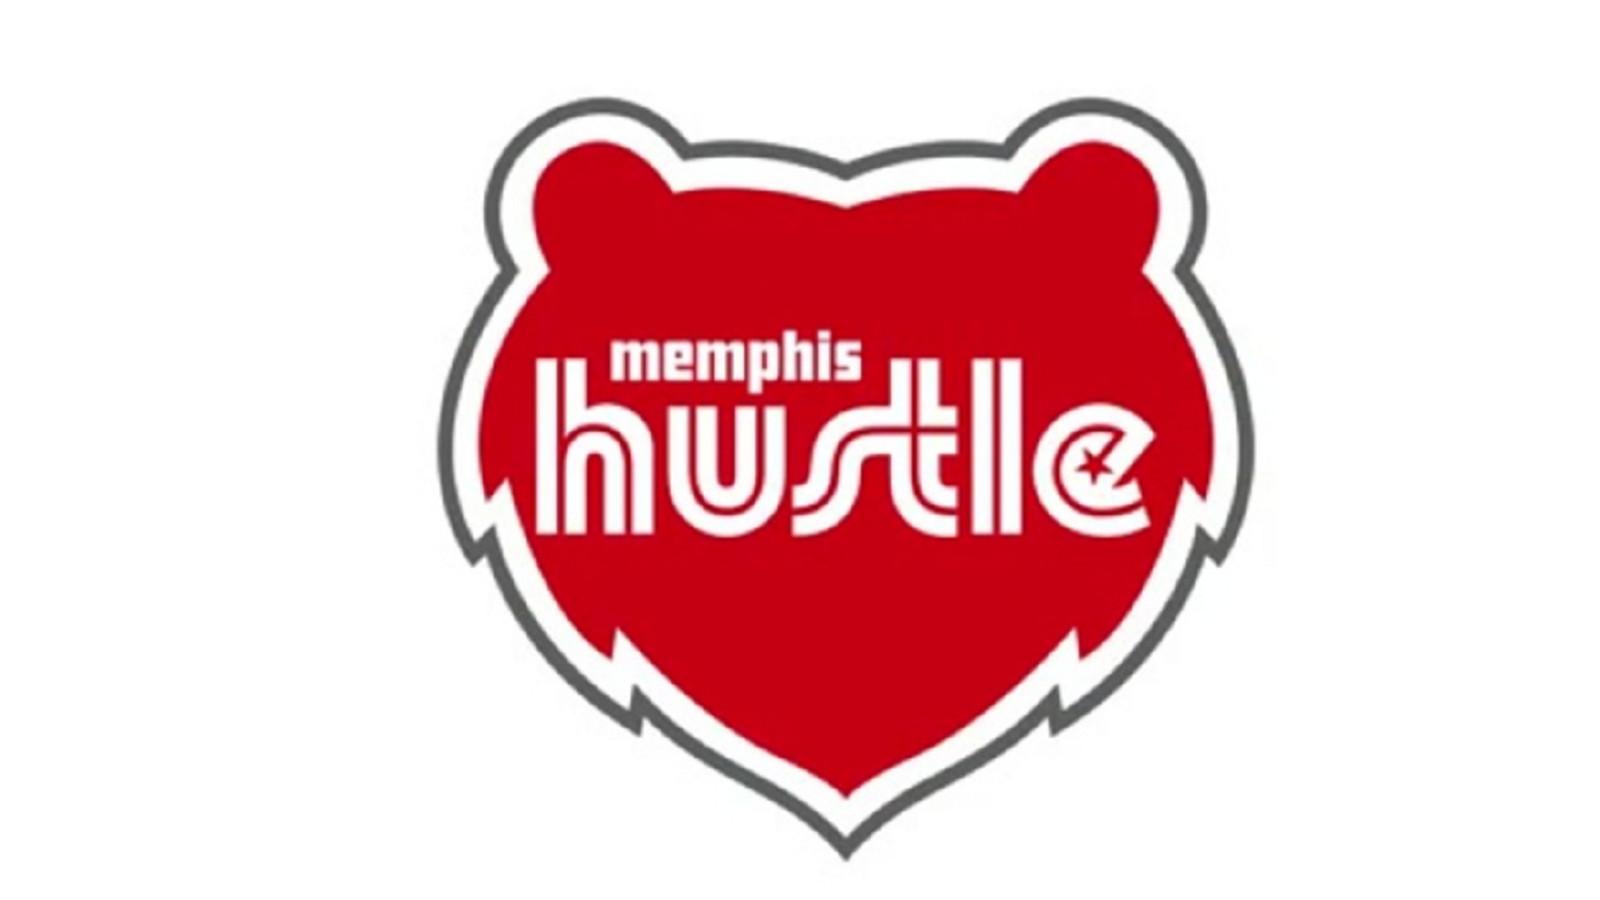 Hustle.0